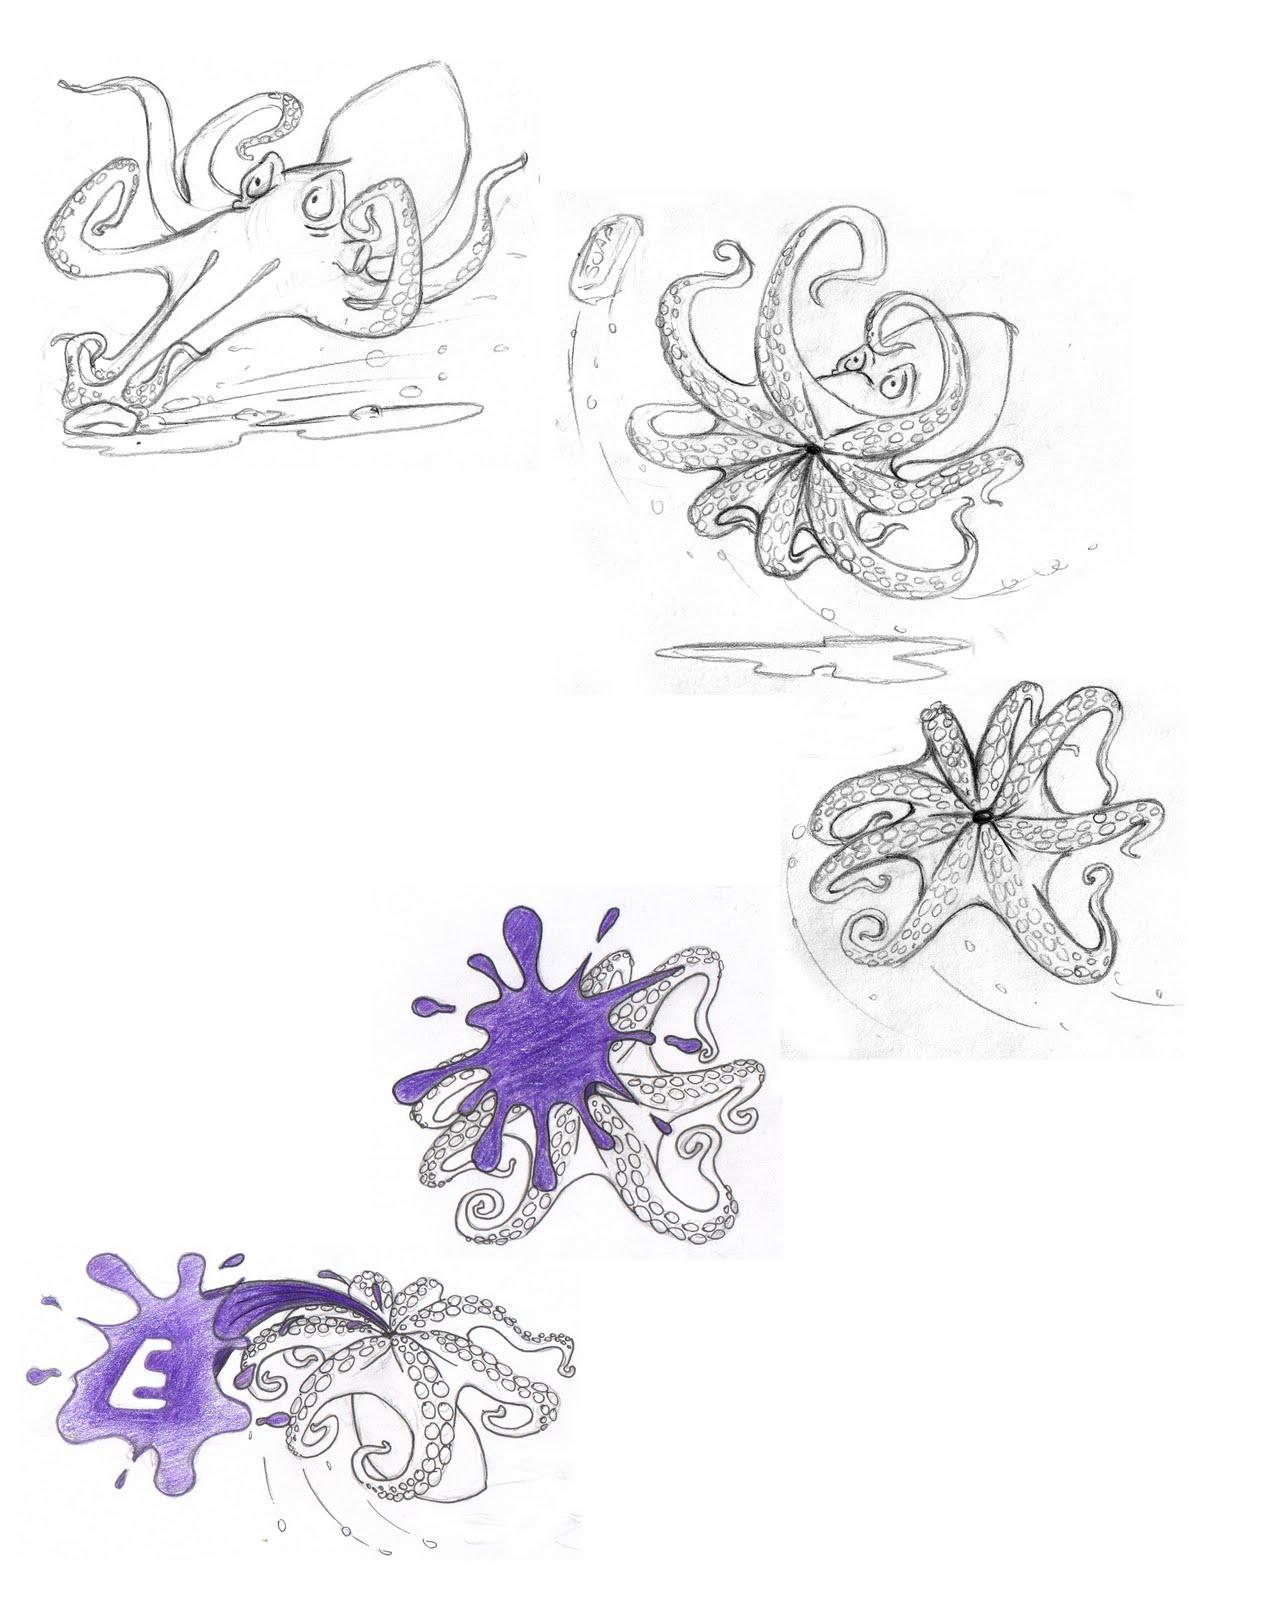 http://4.bp.blogspot.com/_apS0xHCvixI/TENAfxVvejI/AAAAAAAAAXw/QZh5hlqS-14/s1600/Octopus+concepts1.jpg